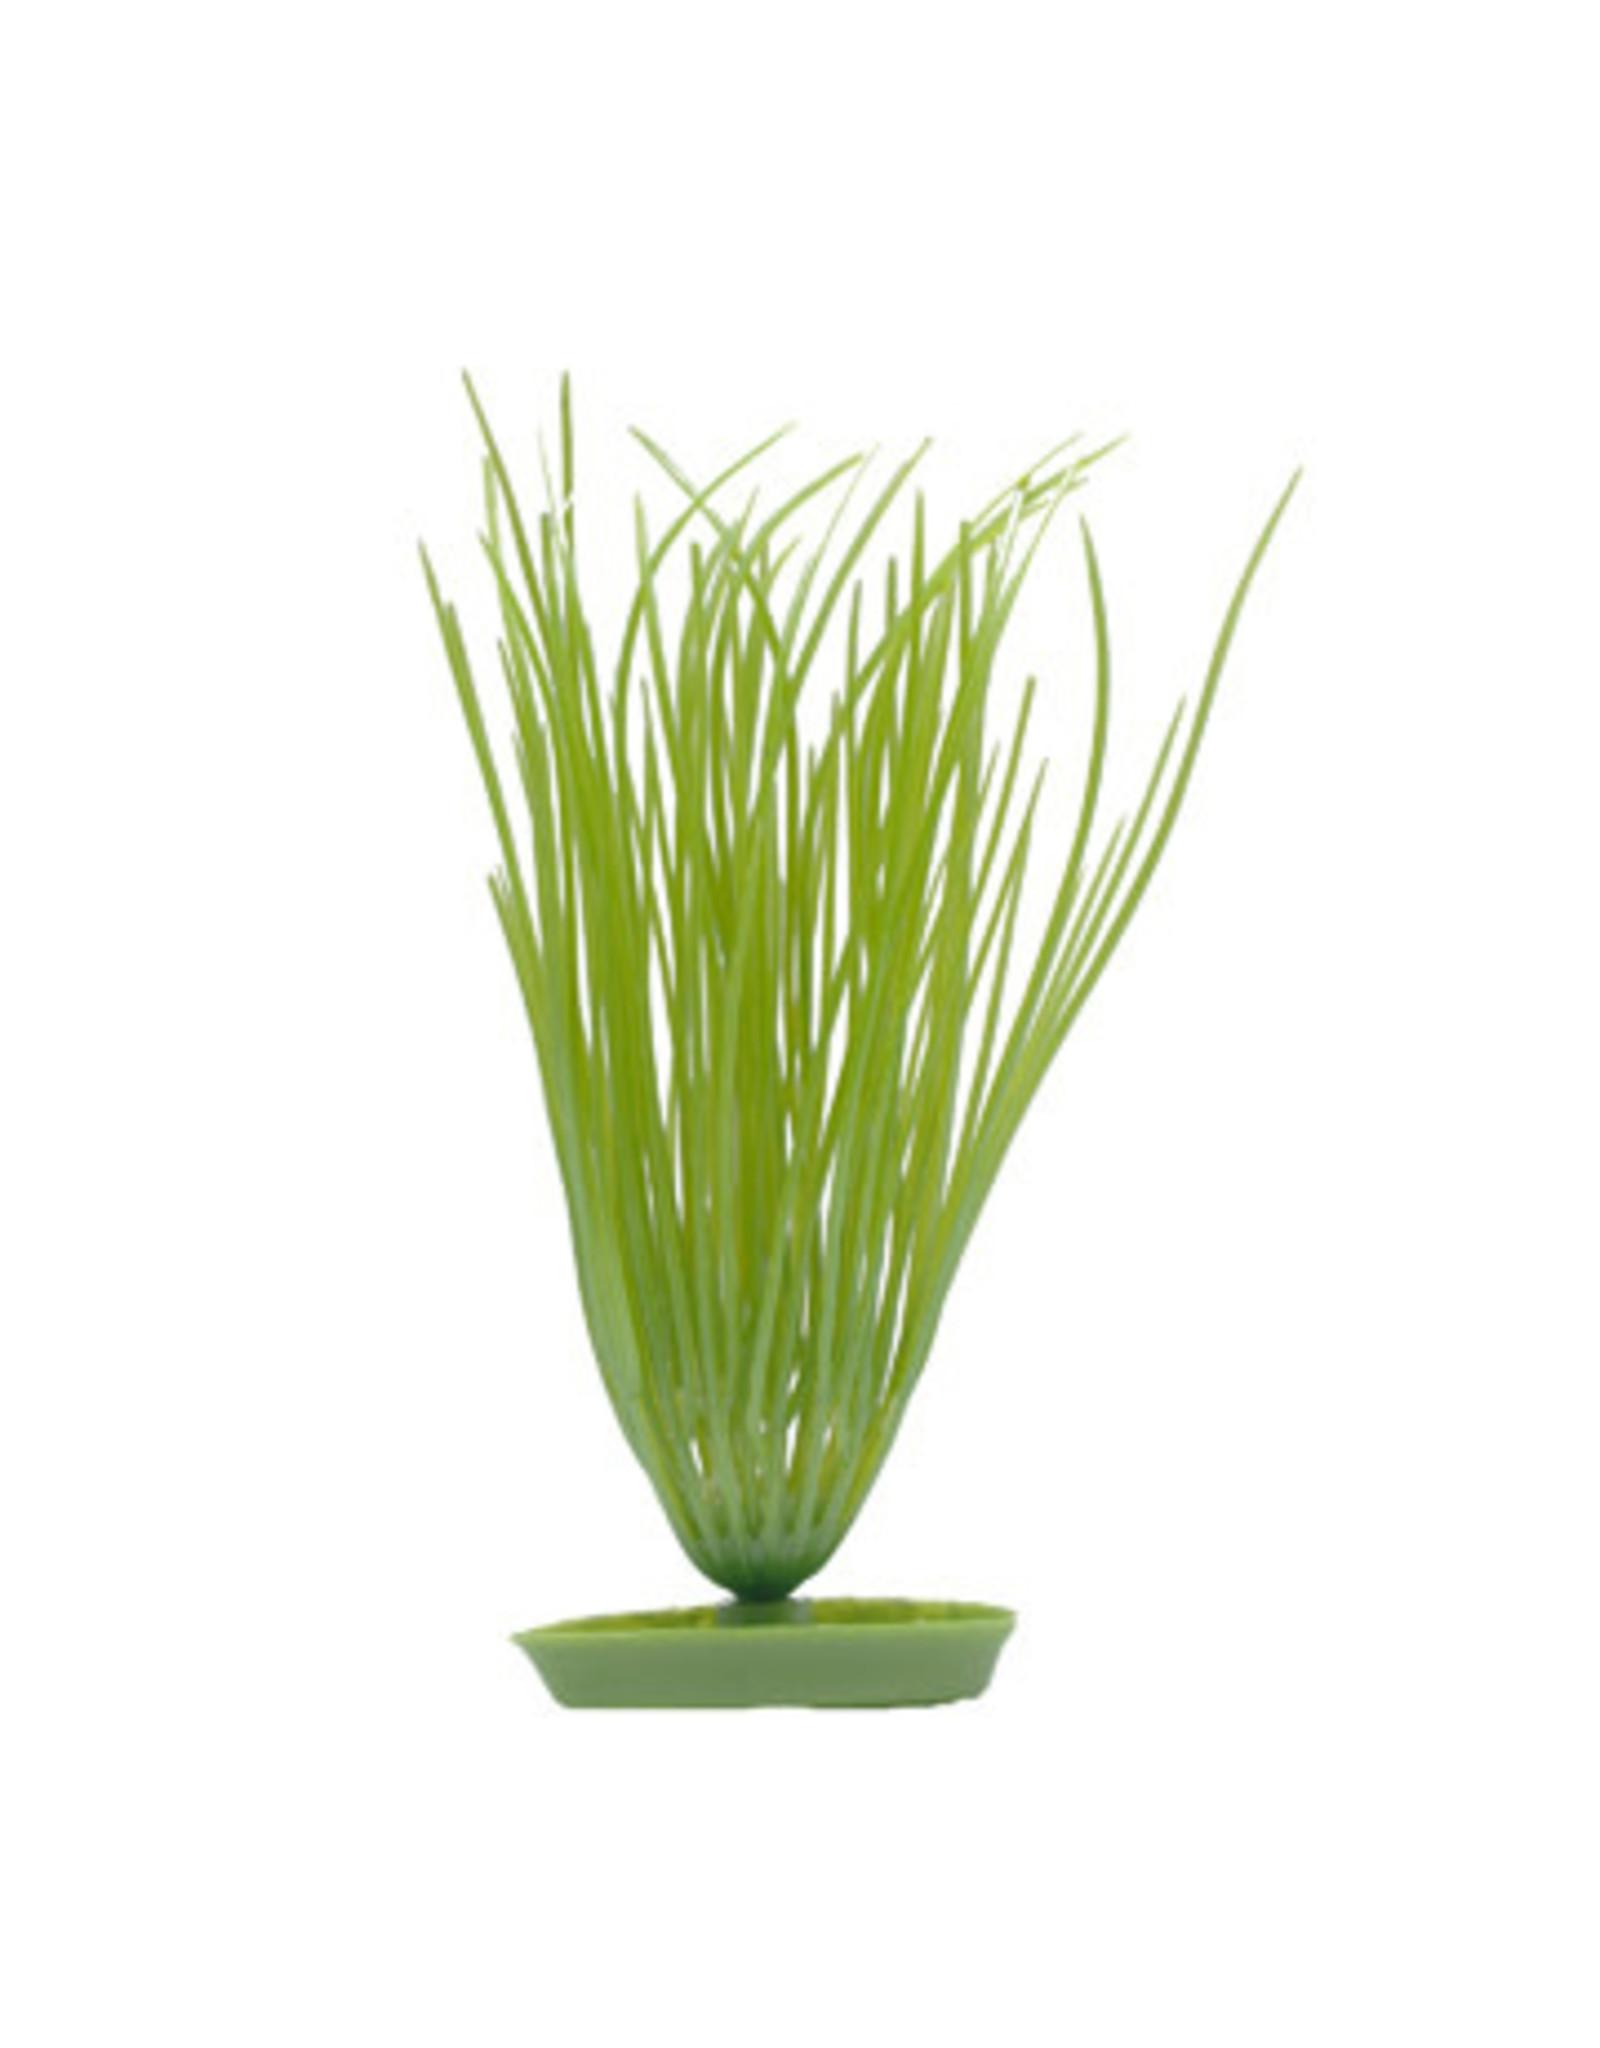 Marina Marina Aquascaper Plastic Plant - Hairgrass - 20 cm (8 in)